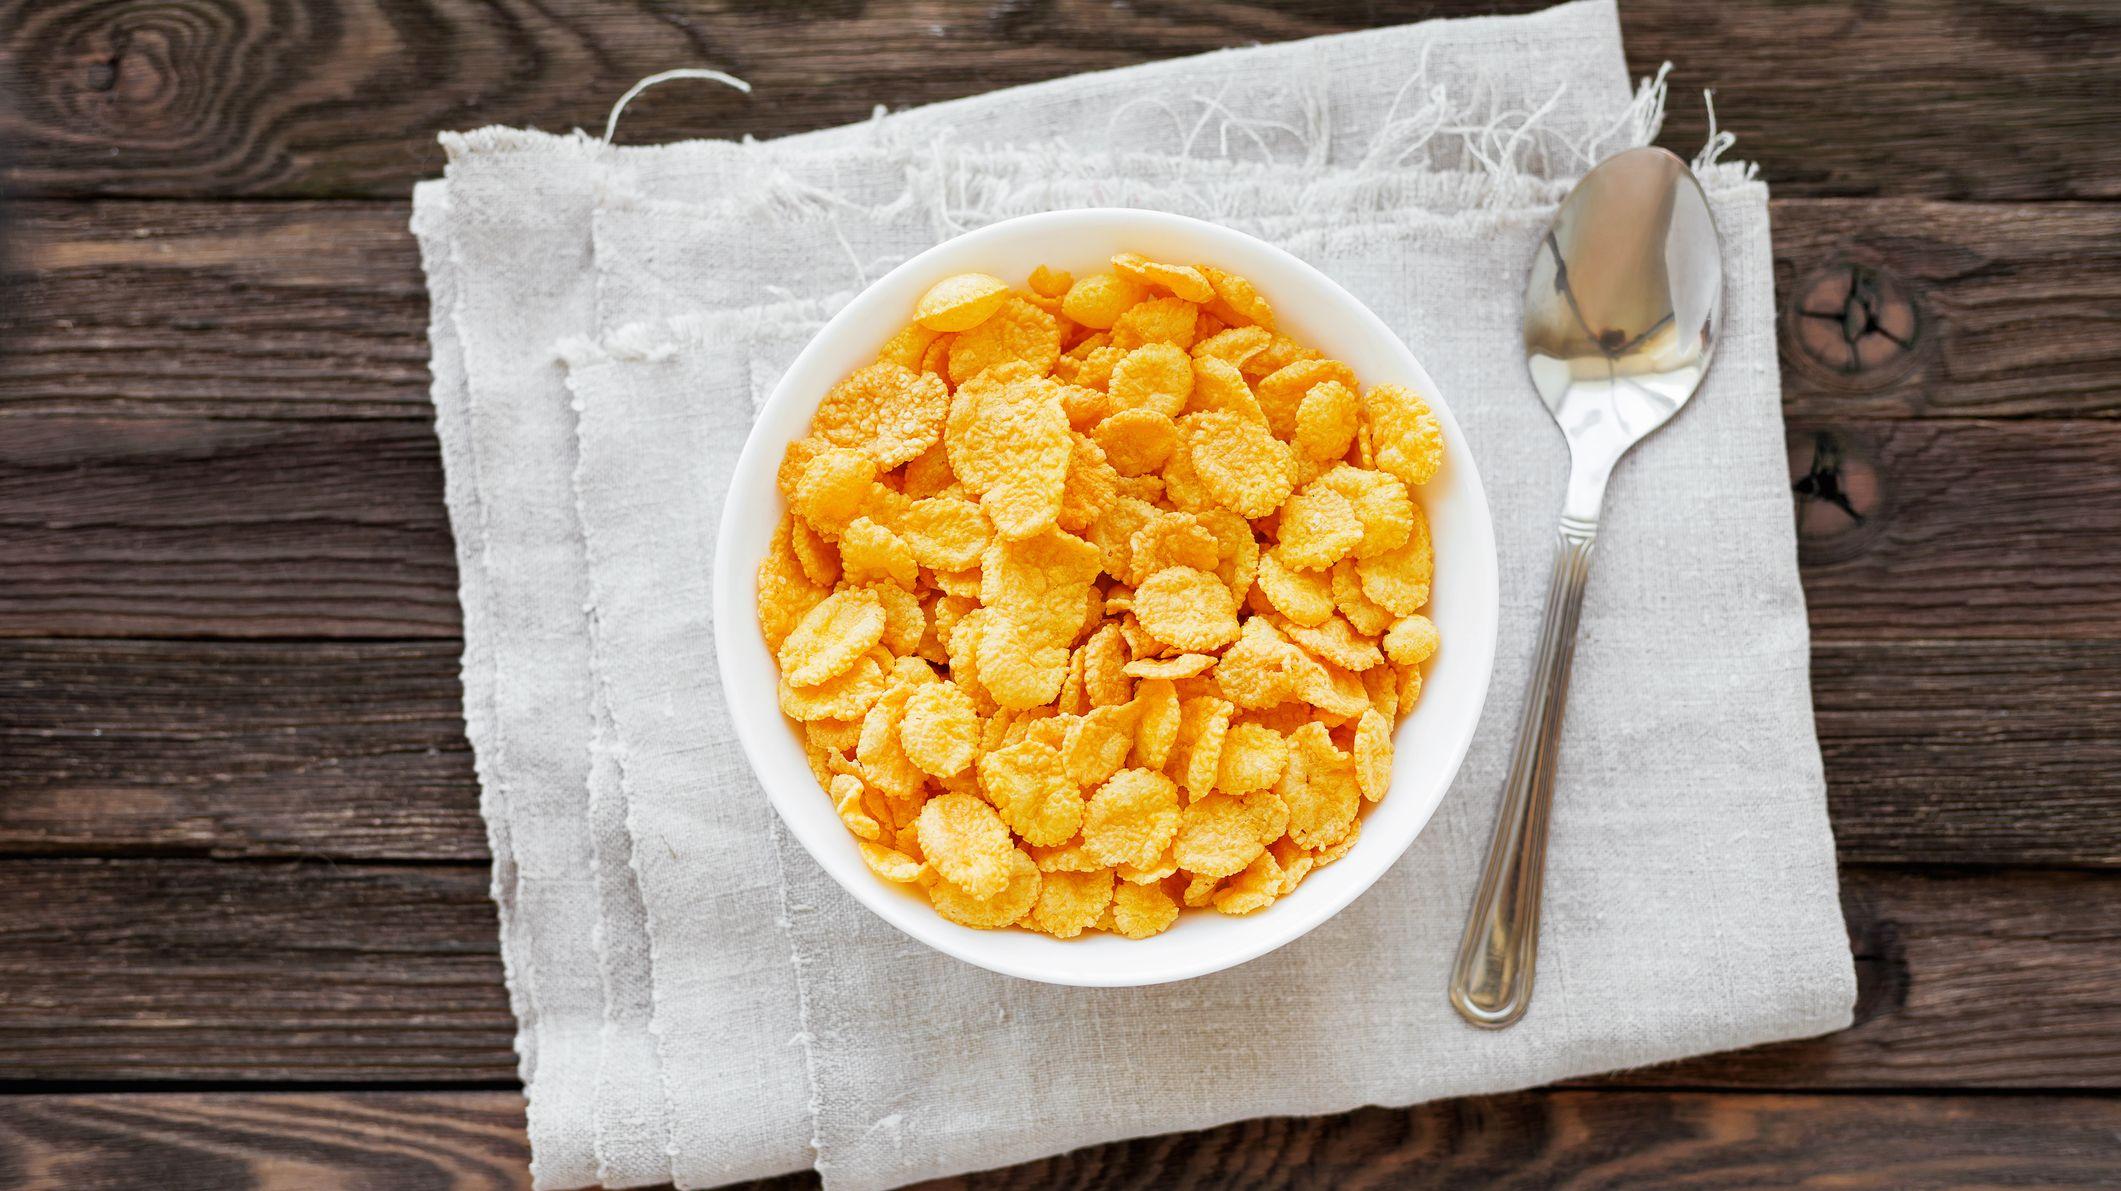 Corn Flakes Were Part Of An Anti-masturbation Crusade photo